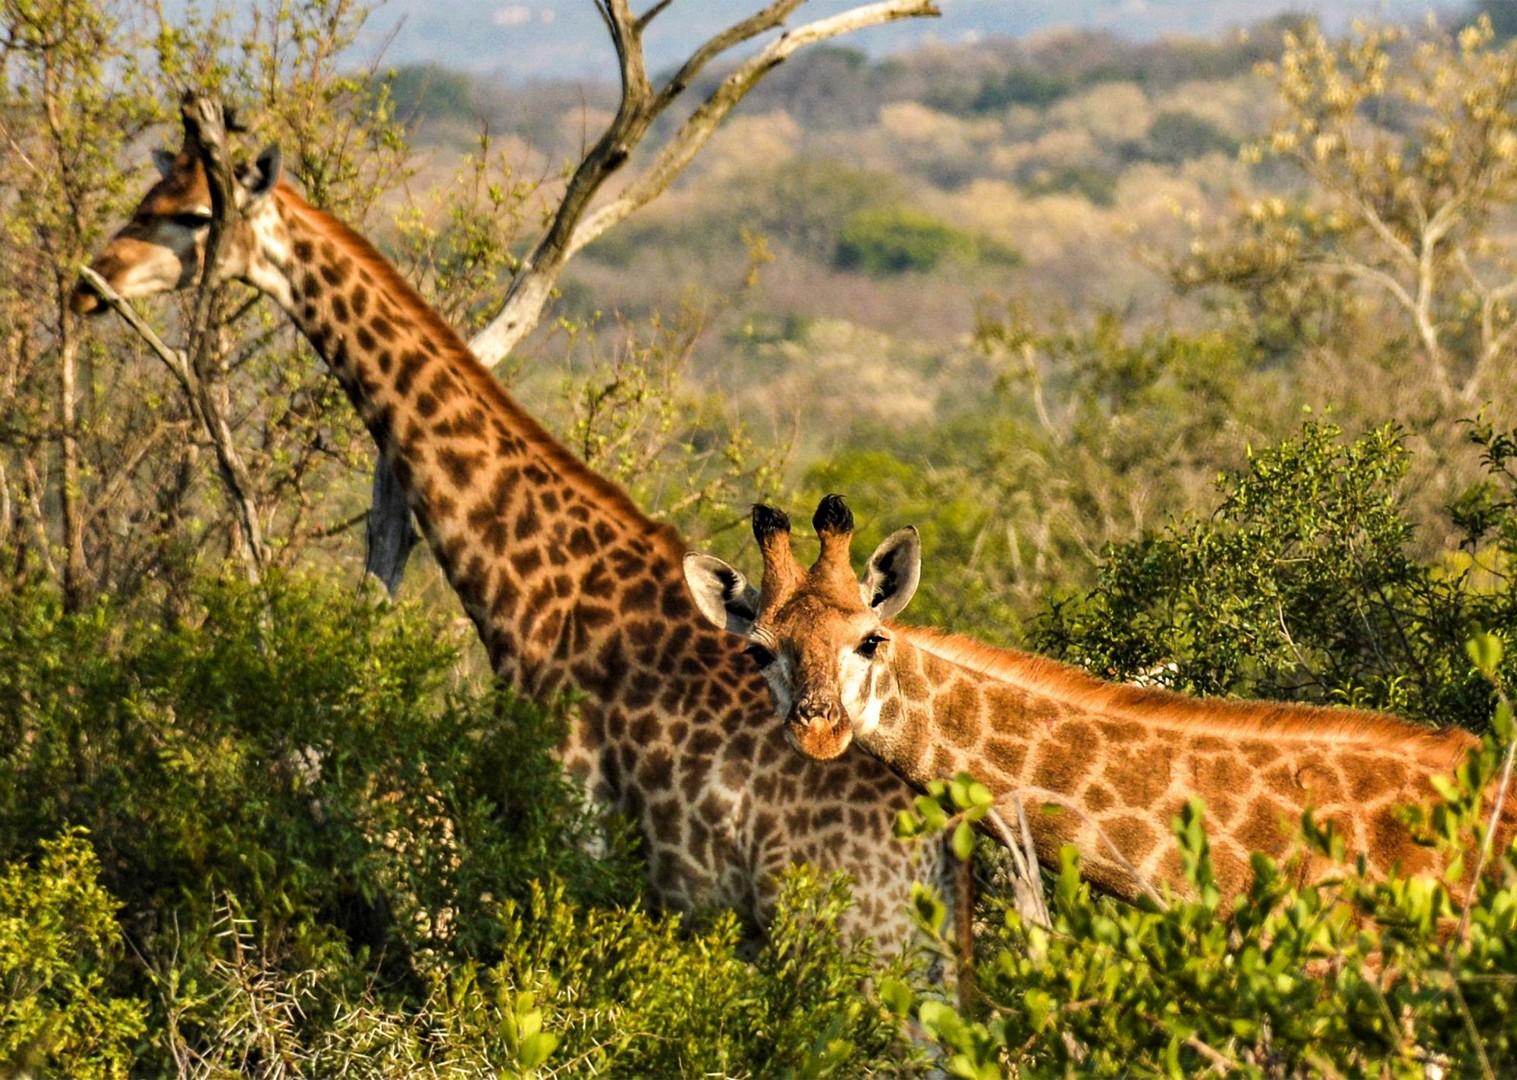 rgfdgfg14.jpg - Eswatini (Swaziland) - Cycling Safari - Cycling Adventures